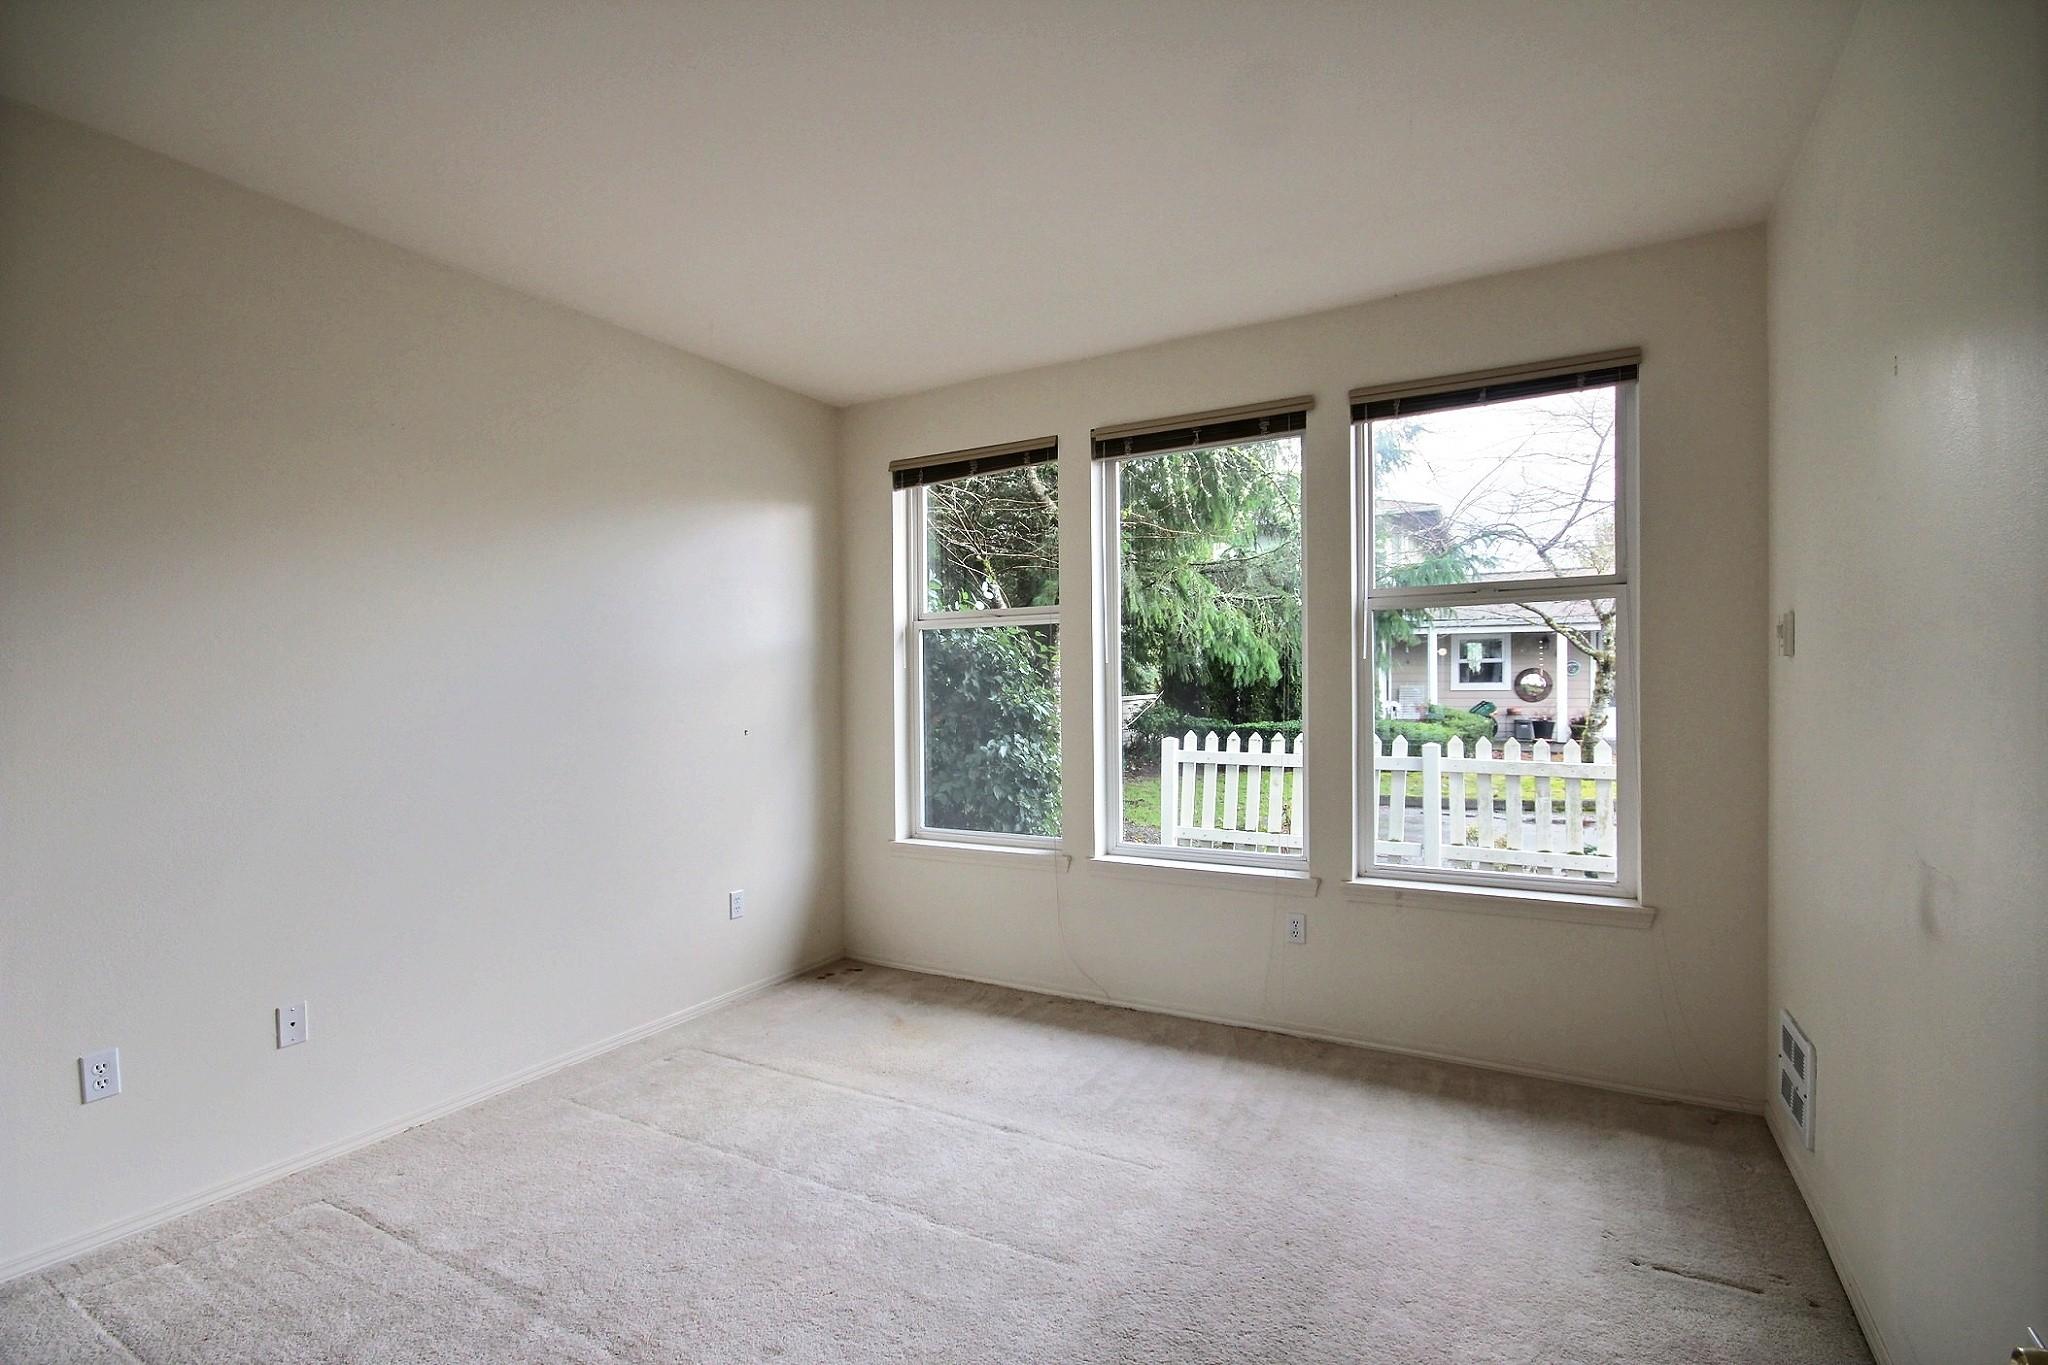 561-691401 - Bedroom 1.jpg